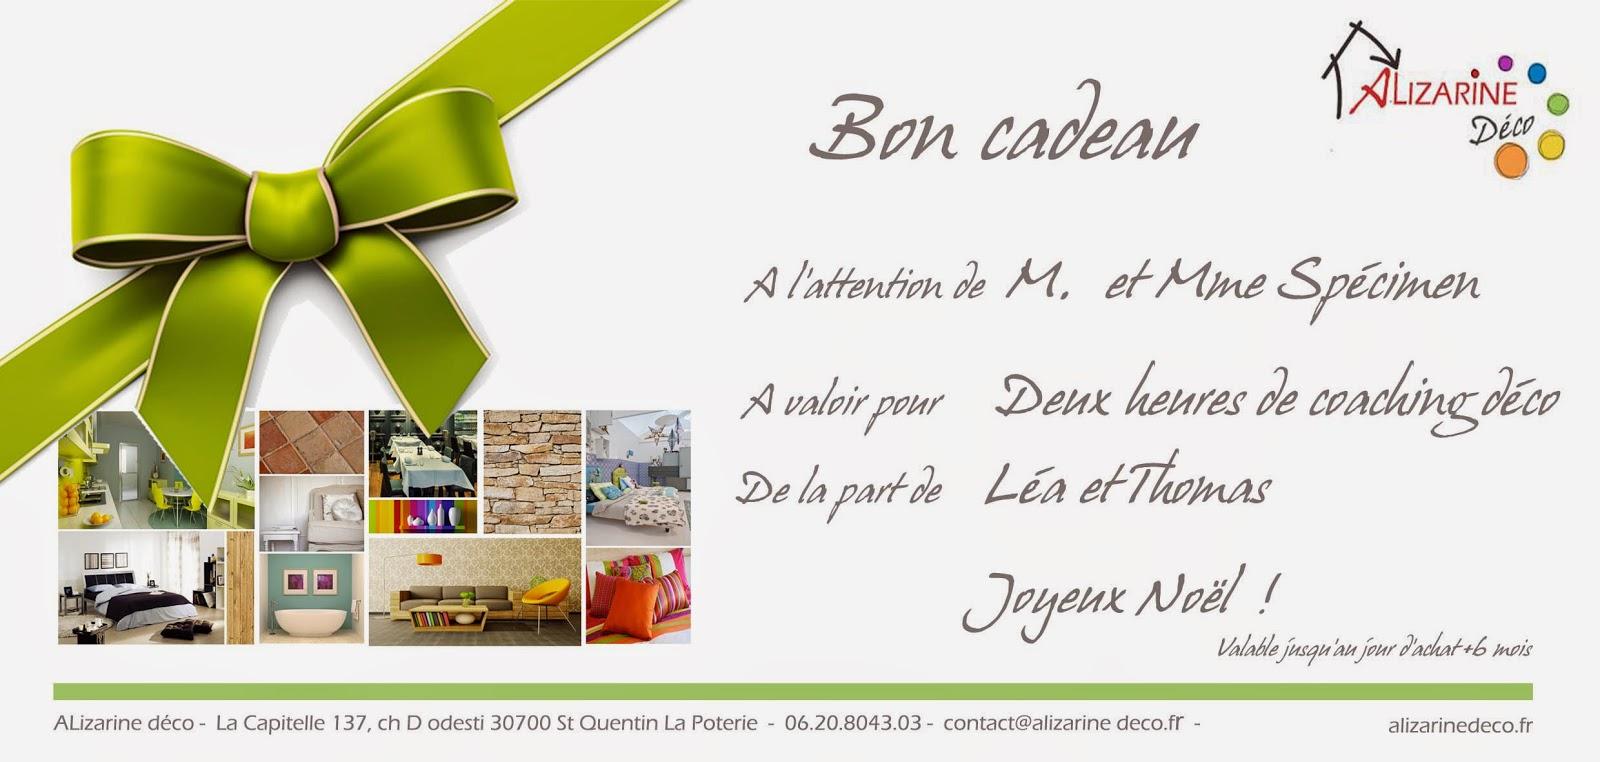 Modele Bon Cadeau Restaurant  Ef Bf Bd Imprimer Gratuit